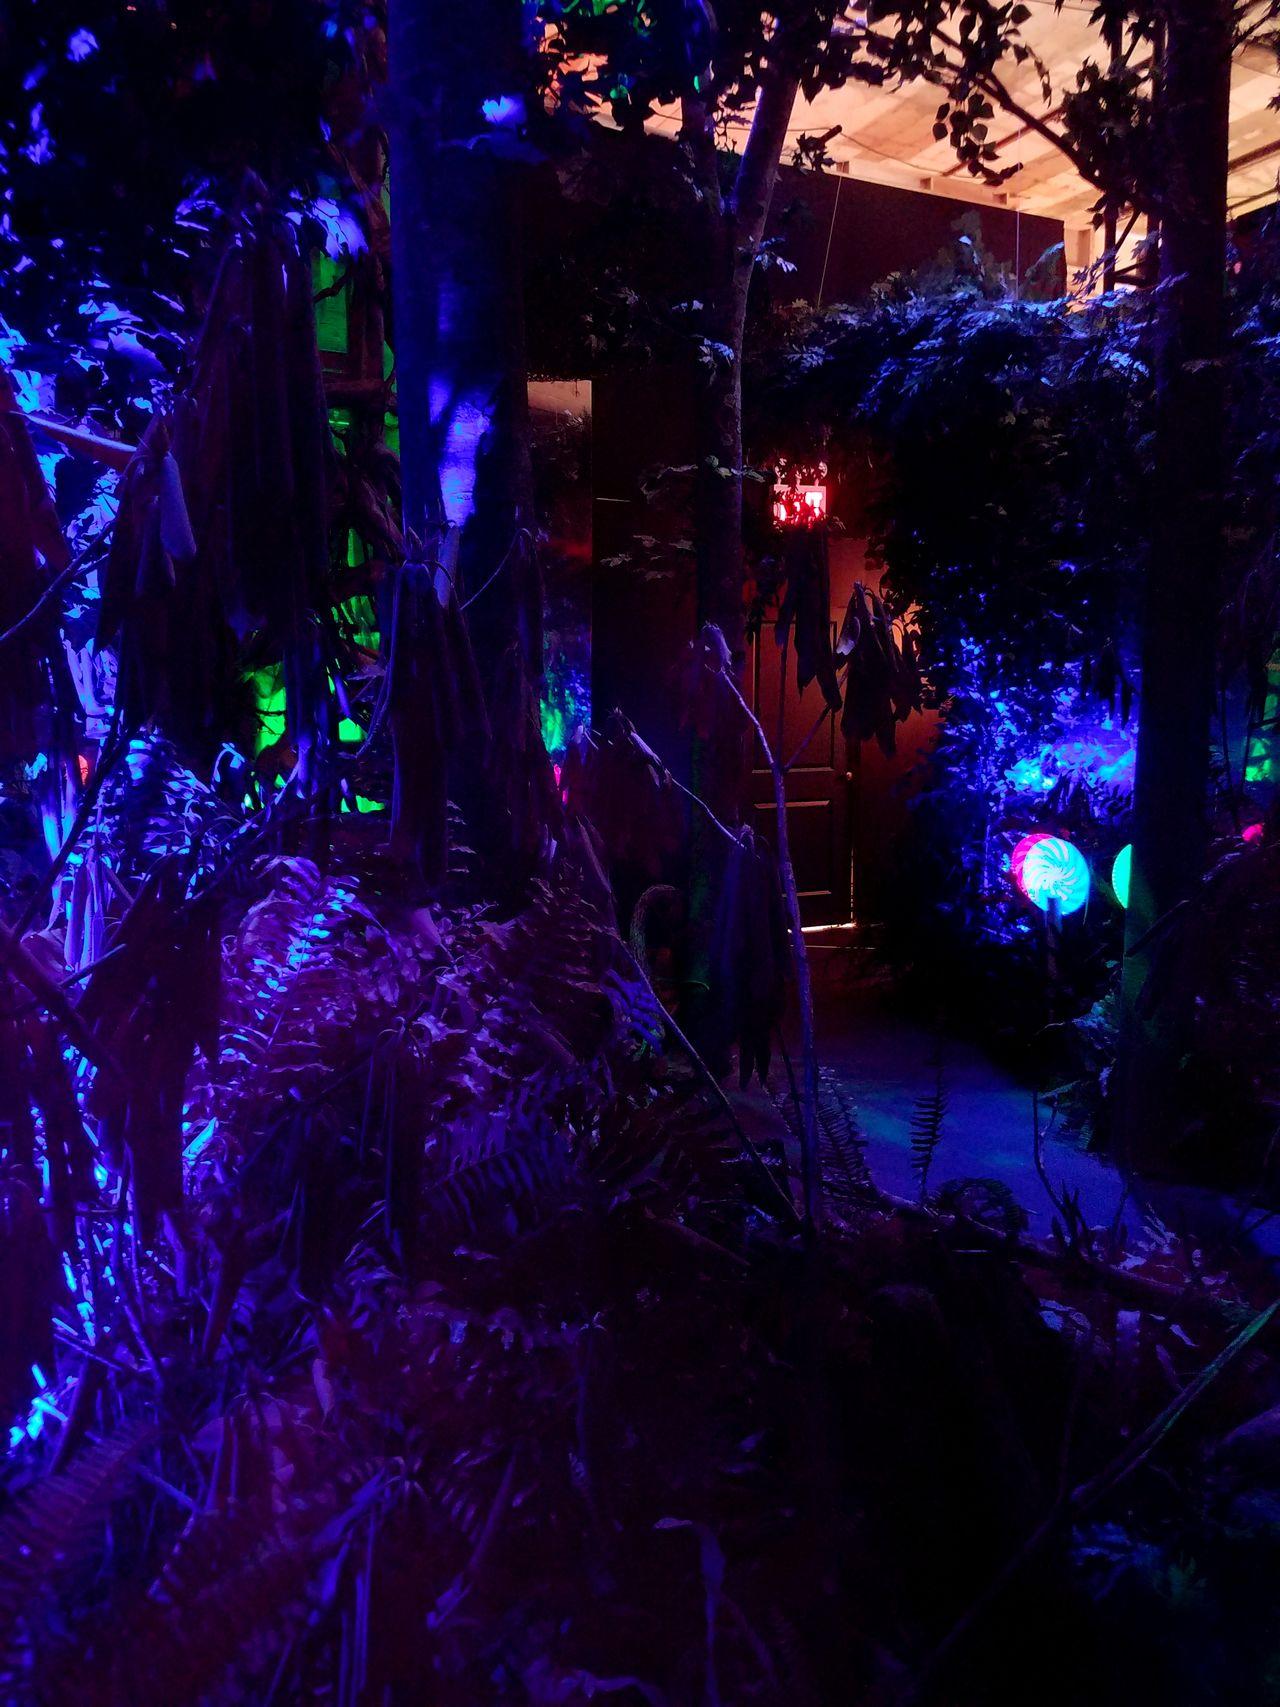 The Magician Indoors  Tree Illuminated Night